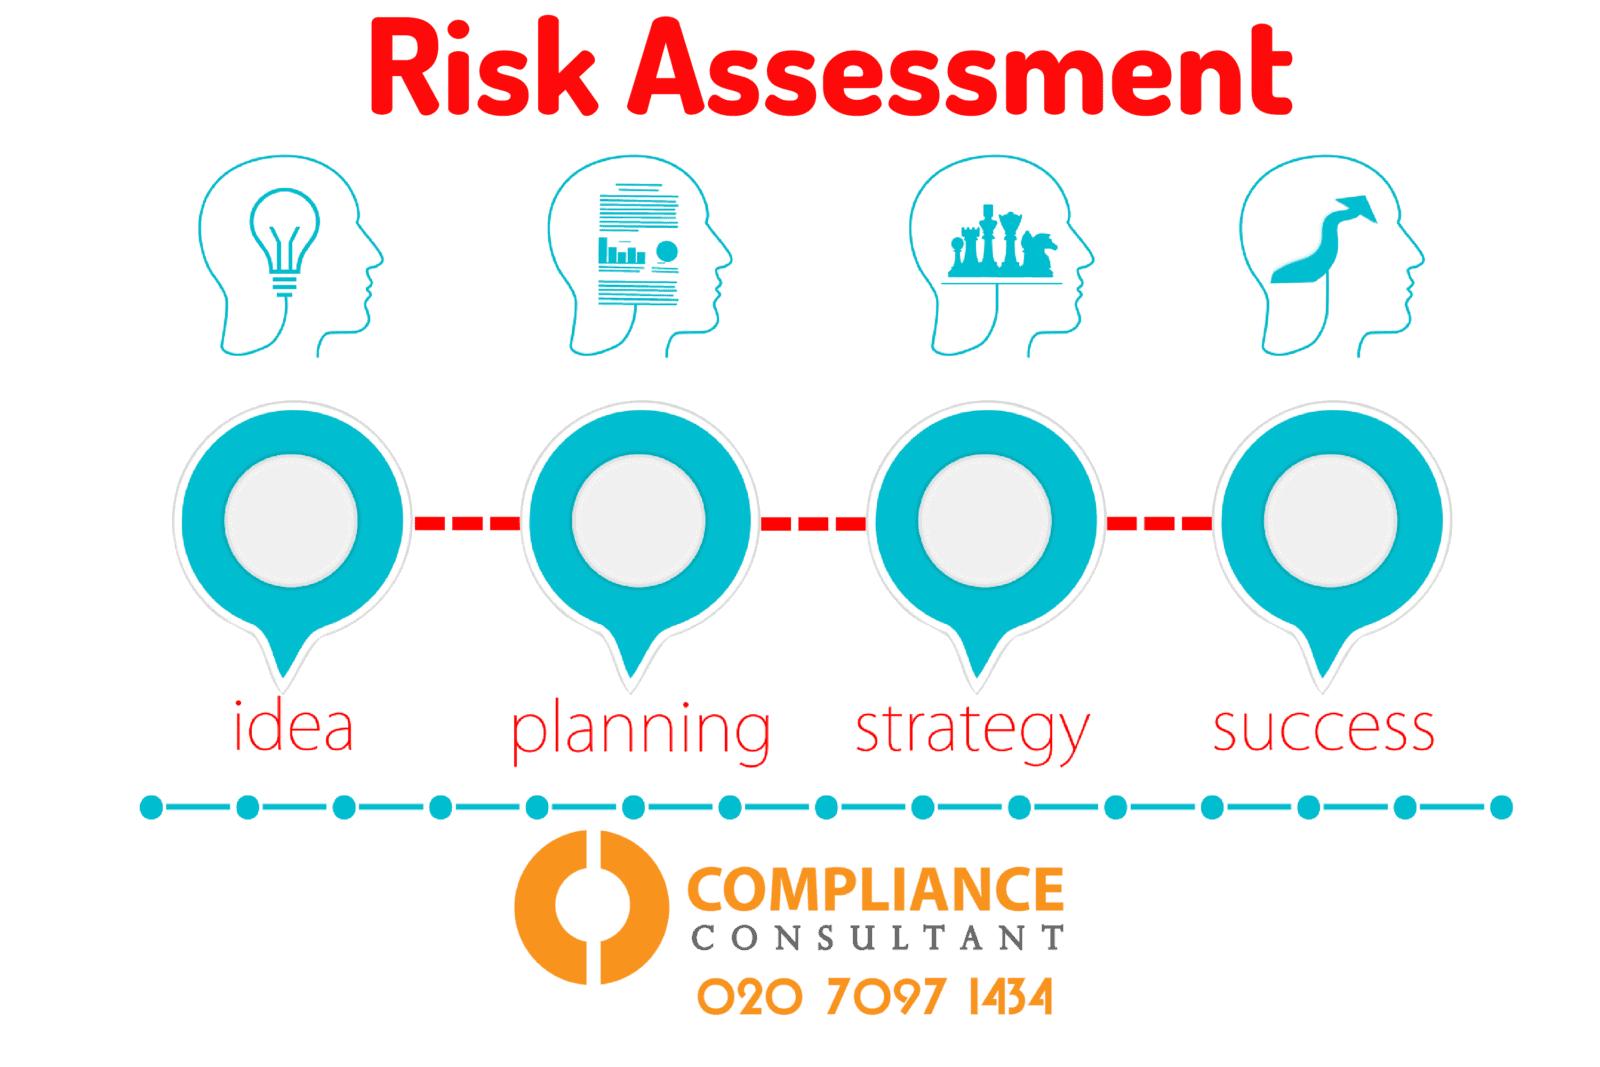 Business Risk Assessment image